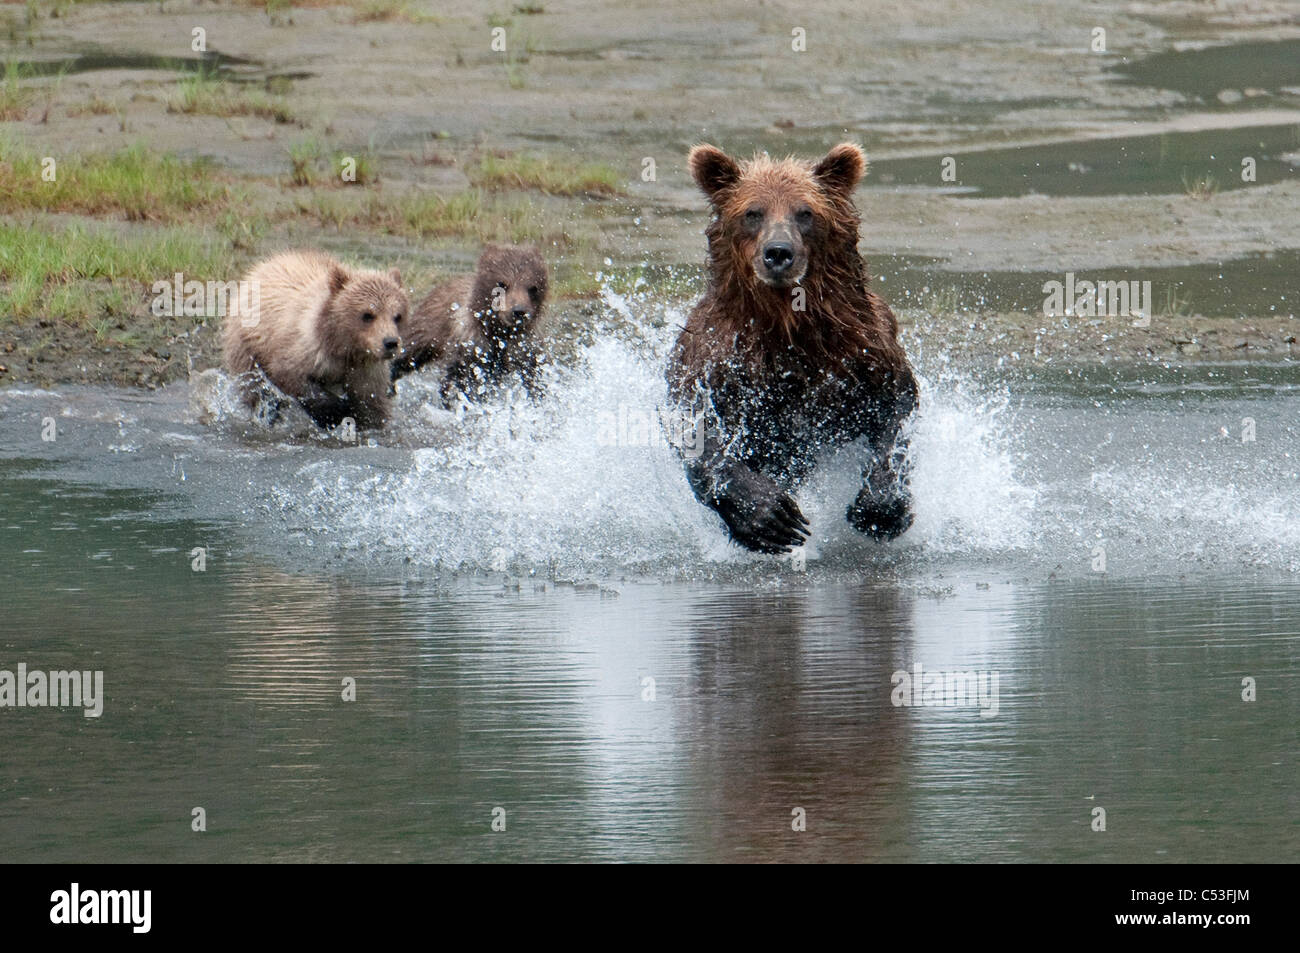 Braunbär Sau jagt Lachse beobachten ihre jungen vom Strand, Chinitna Bay, Lake Clark National Park, Südwest-Alaska Stockfoto